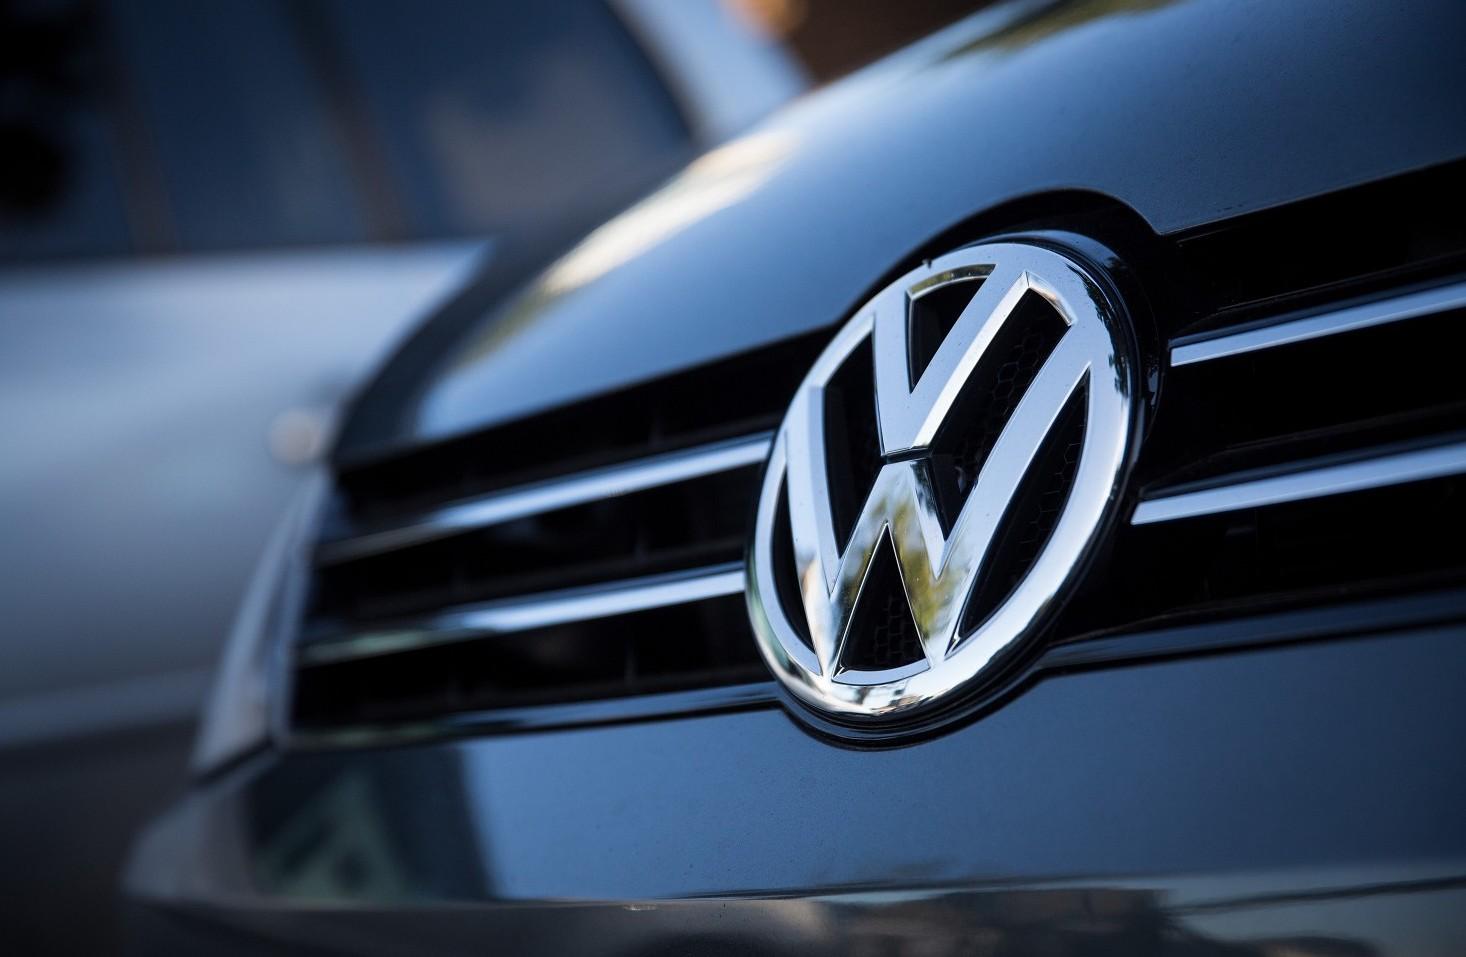 Auto Gpl Volkswagen 2019 nuove in uscita